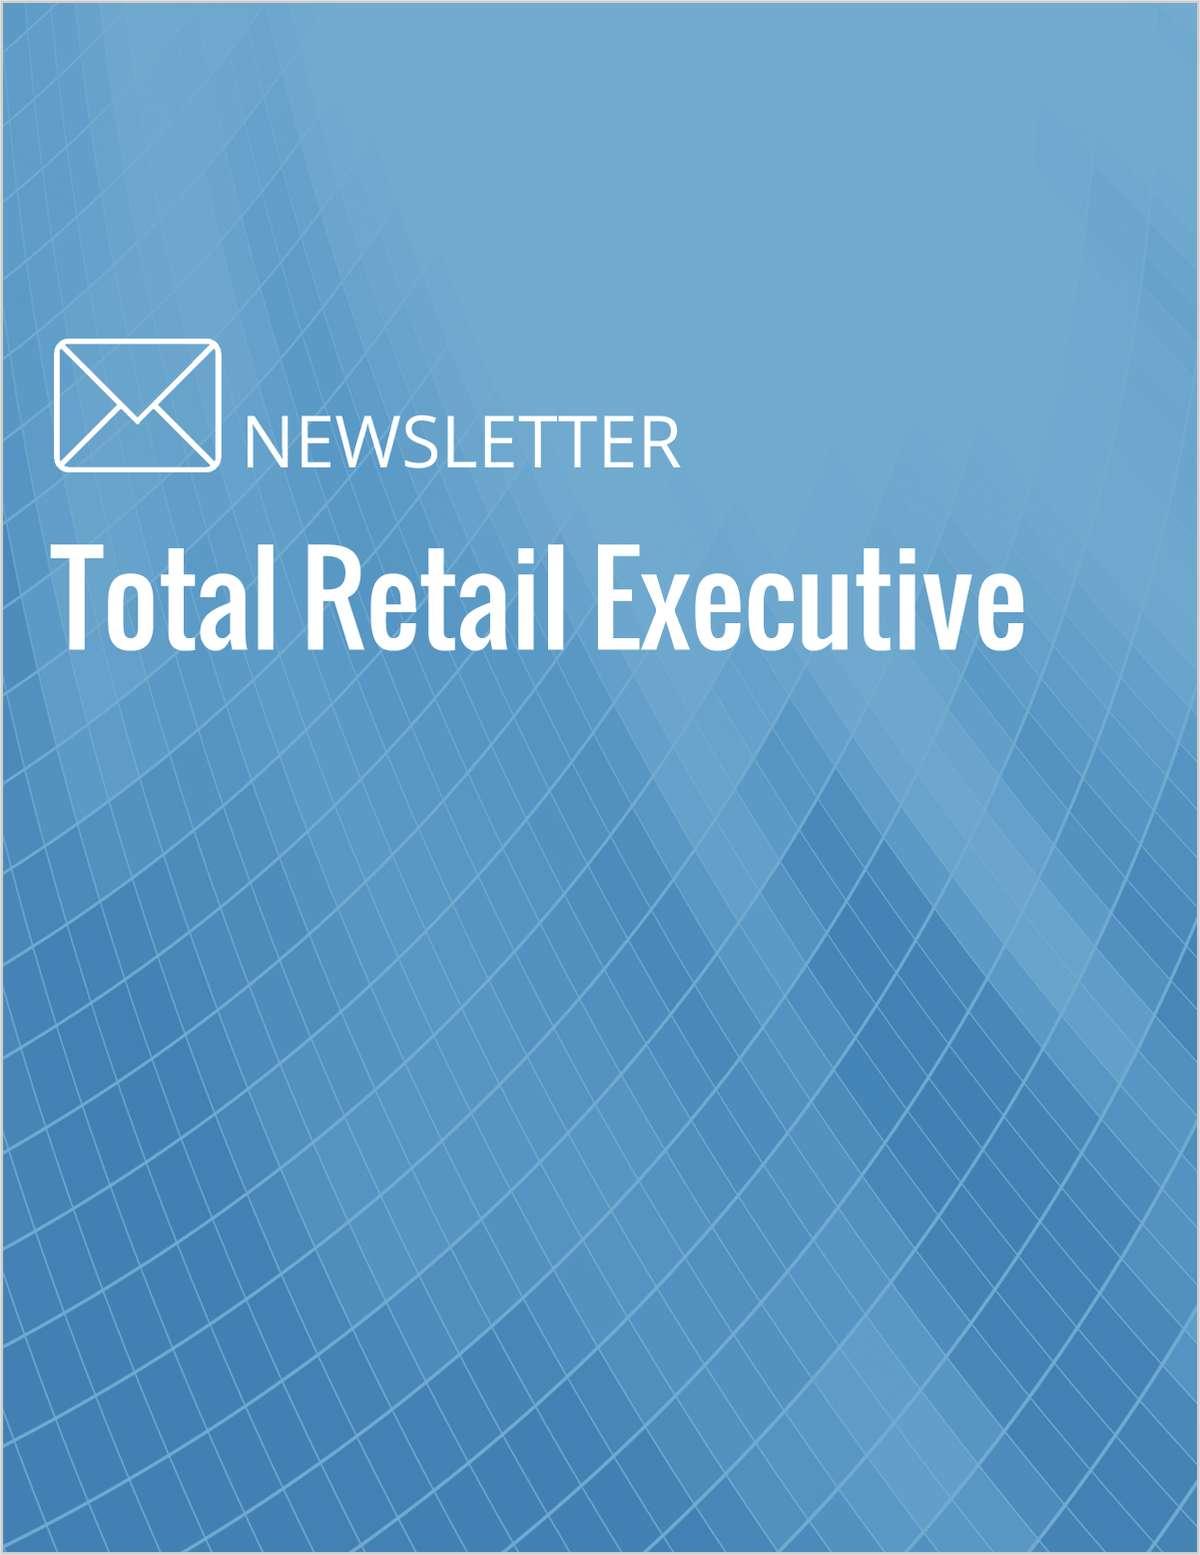 Total Retail Executive